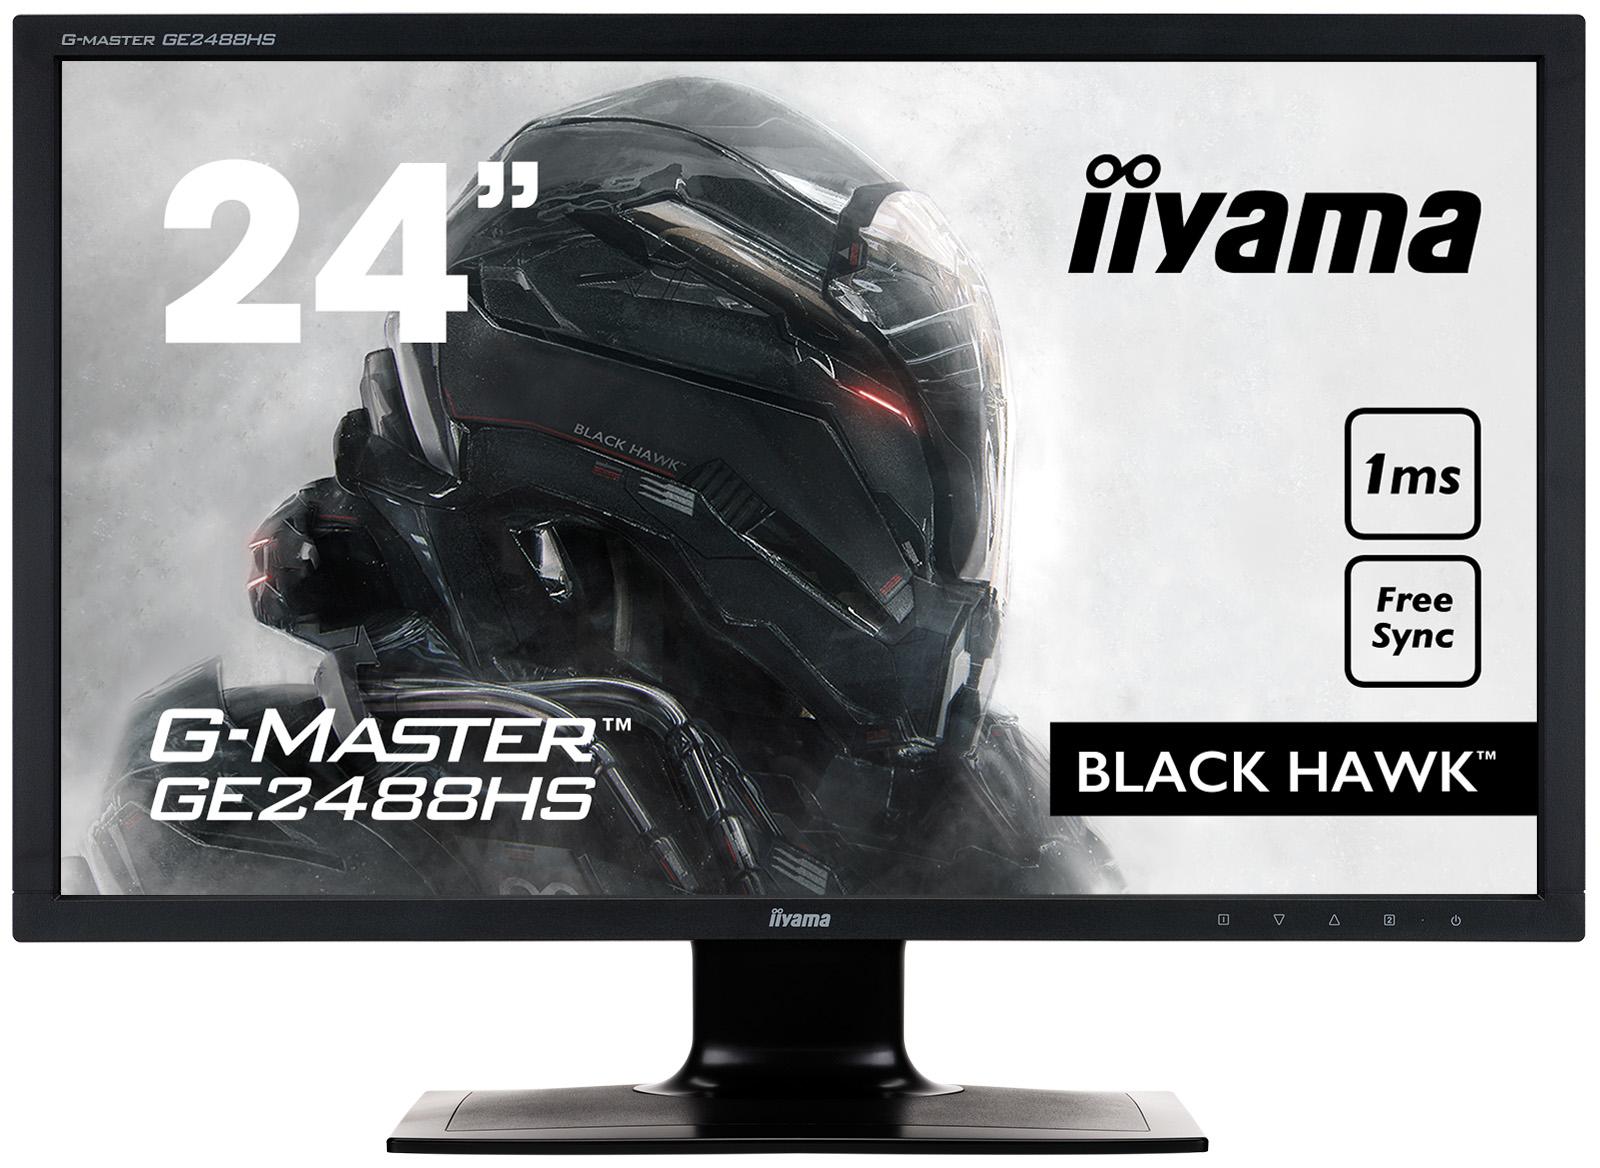 IIYAMA GE2488HS-B2 G-MASTER 24